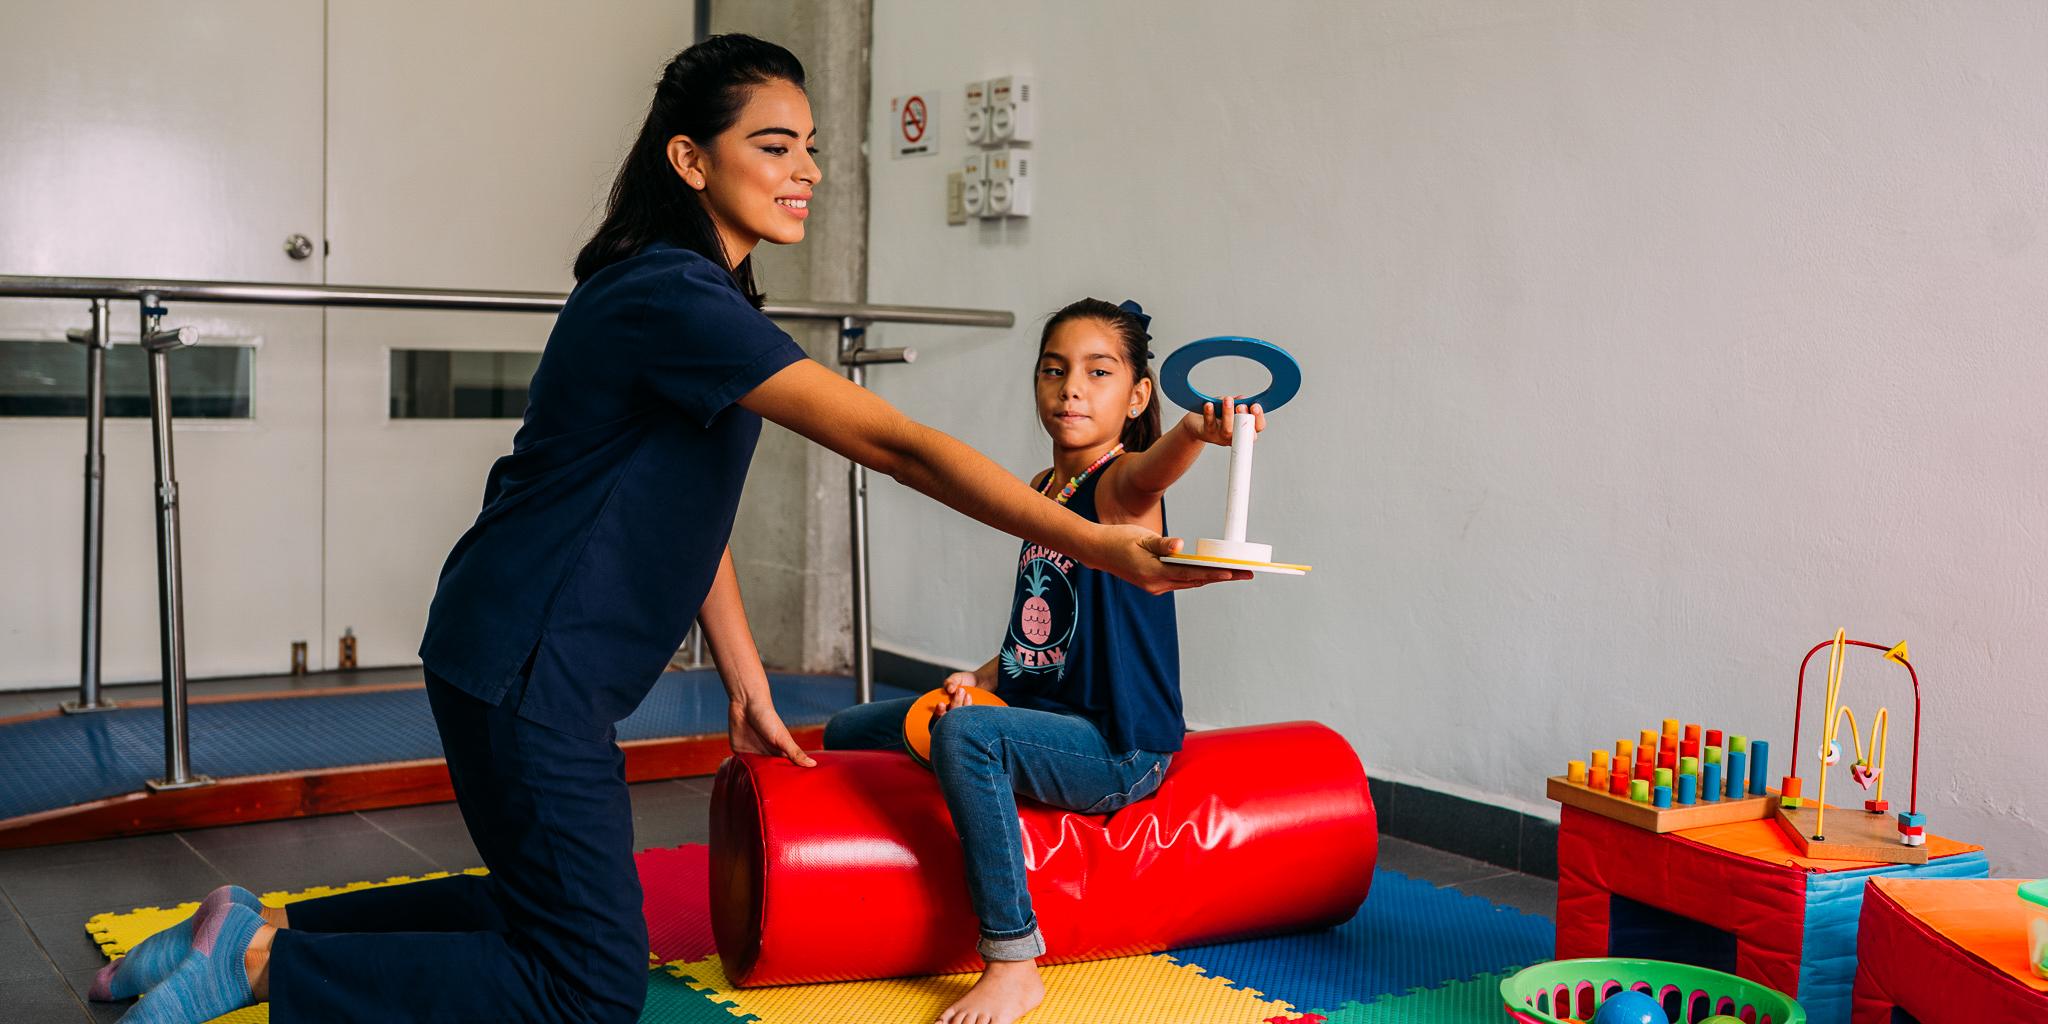 universidad-marista-fisioterapia-rehabilitacion